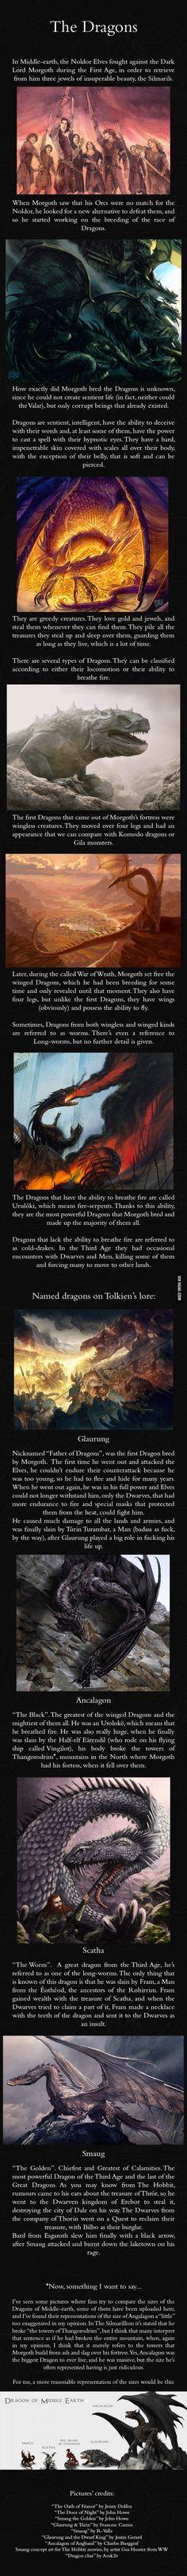 Dragons - J.R.R. Tolkien's Mythology - 9GAG